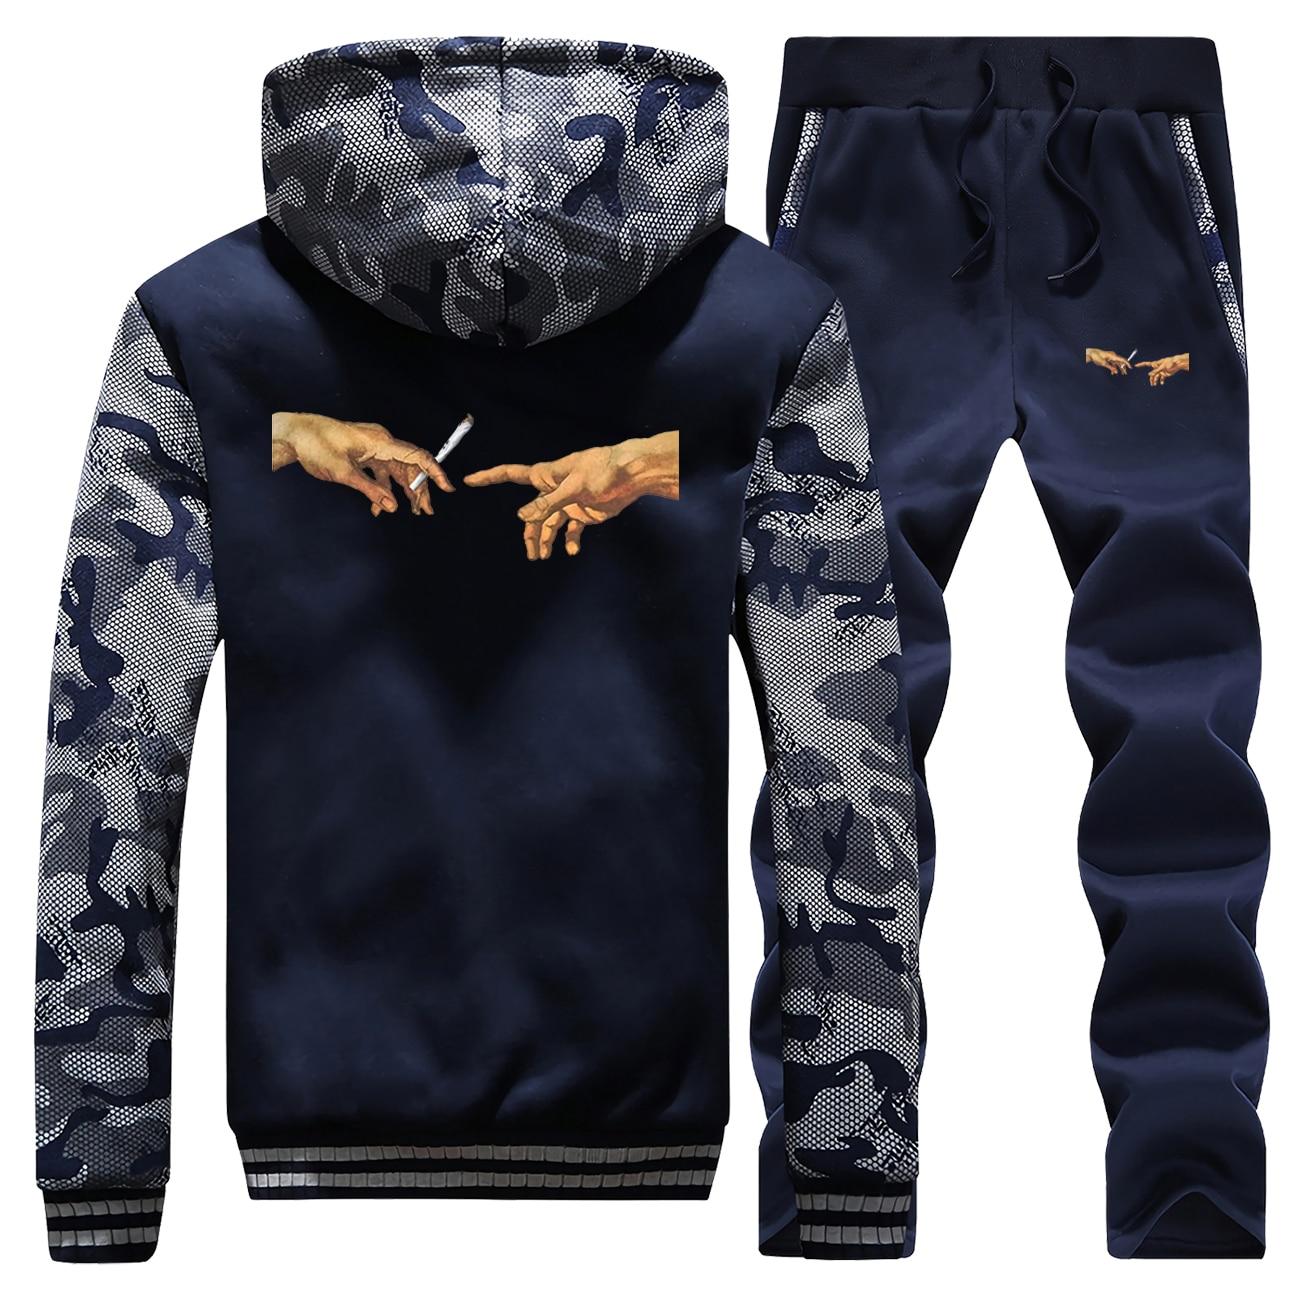 Winter Mens Tracksuit Smoking Vintage Printed Coat Hip Hop Thick Hoodie Men Camouflage Sweatshirt+Sweatpant 2PC Set Male Jacket